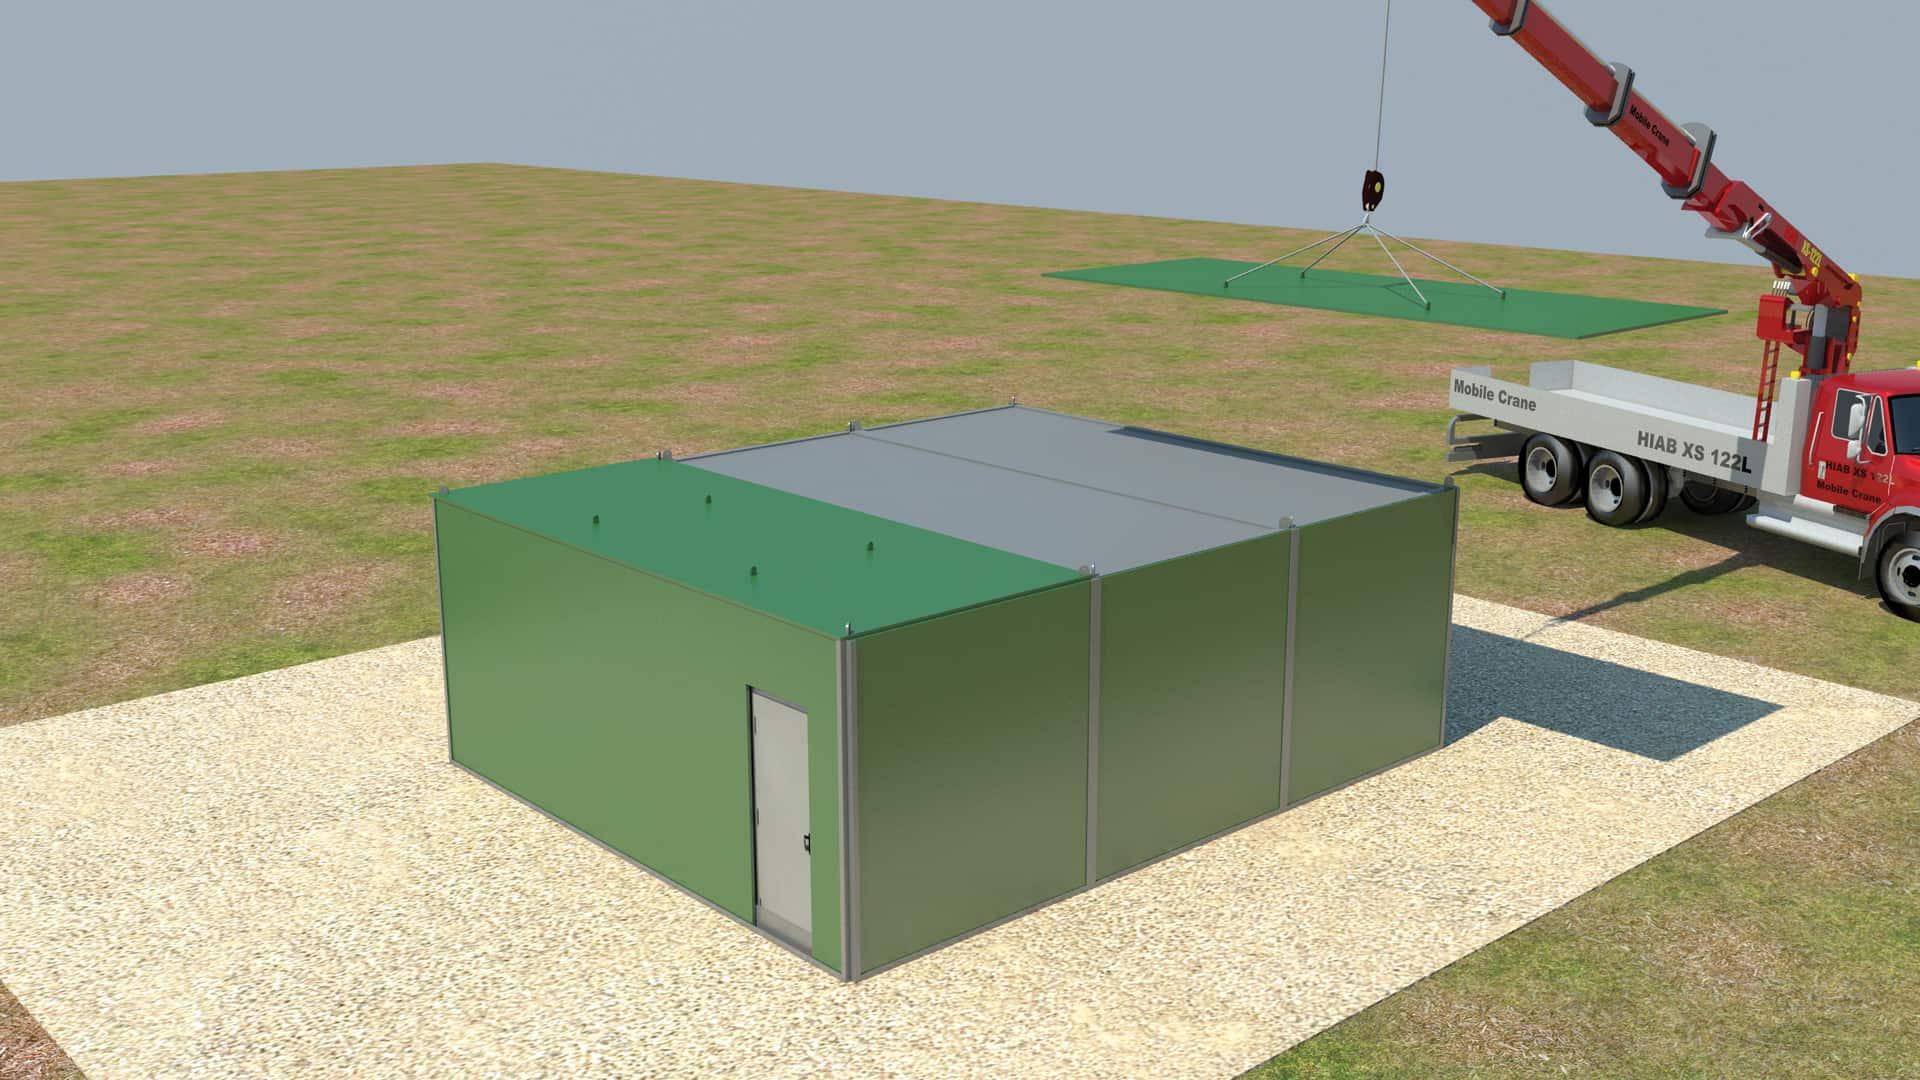 befestigte frontlinien posten mifram security. Black Bedroom Furniture Sets. Home Design Ideas